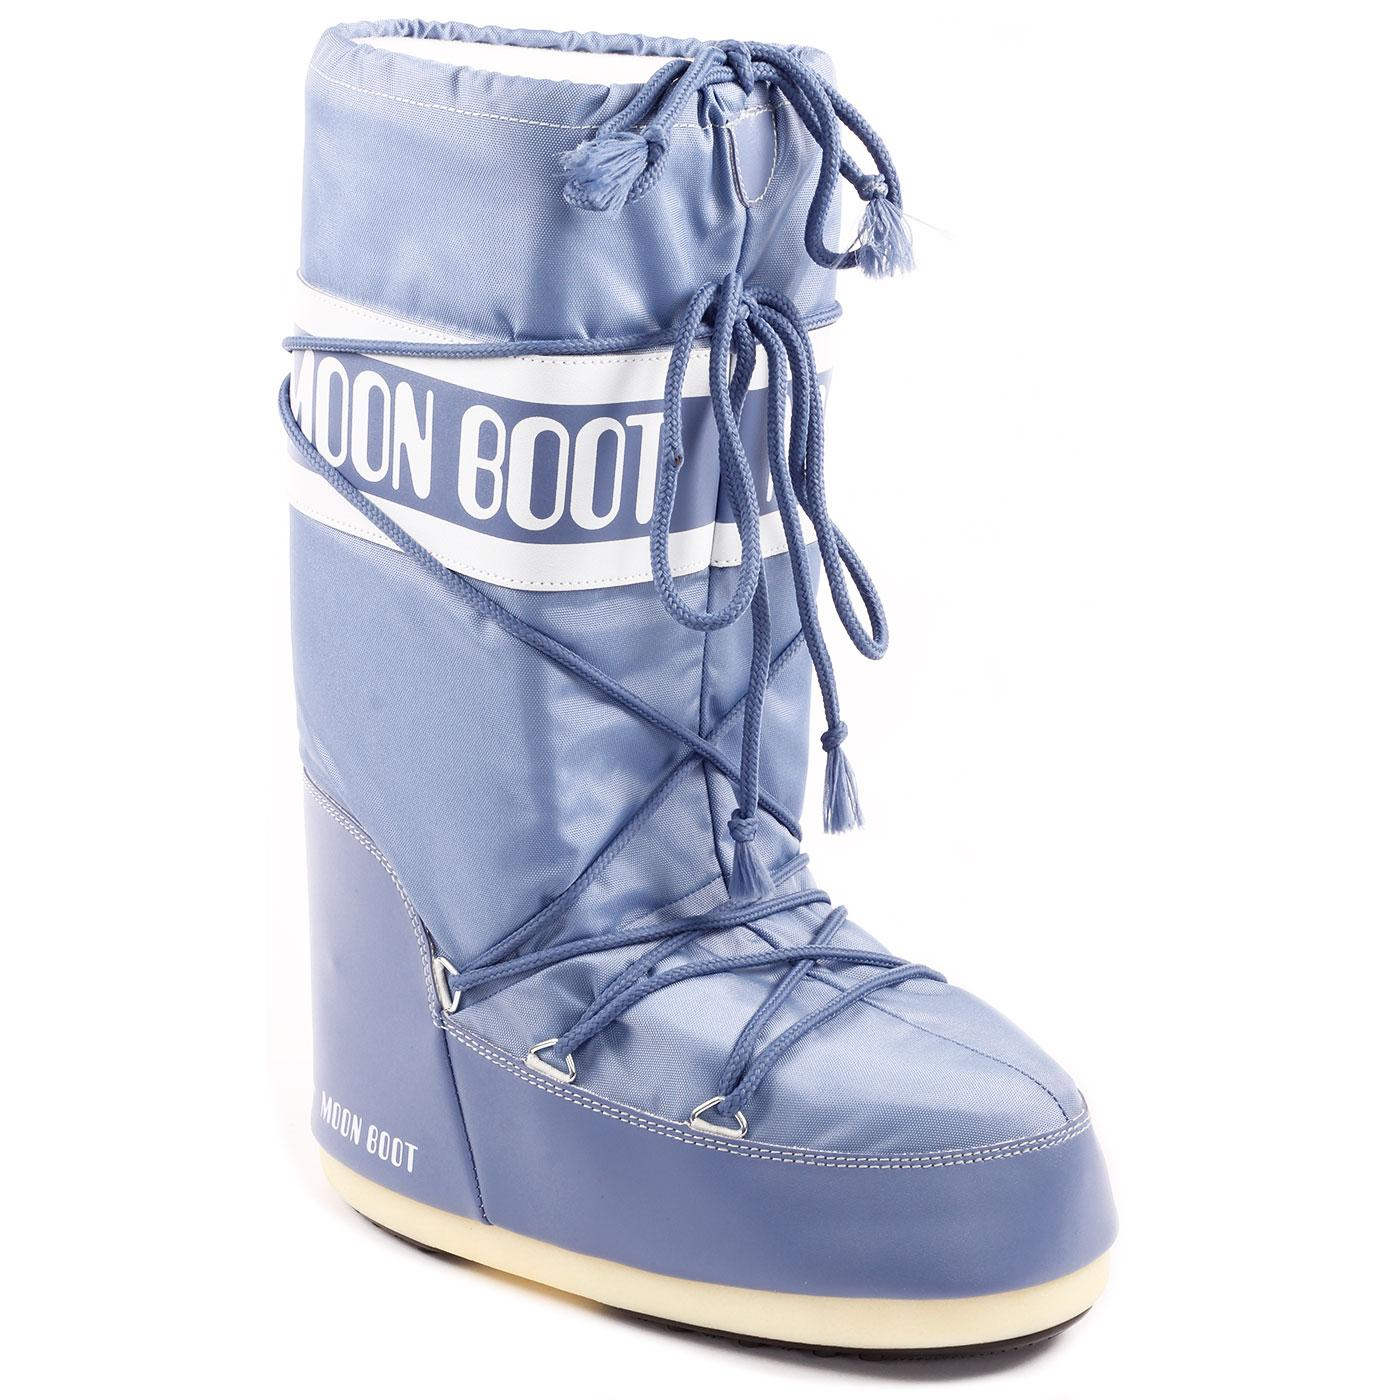 ORIGINAL MOON BOOT Classic Retro 70s Snow Boots SW